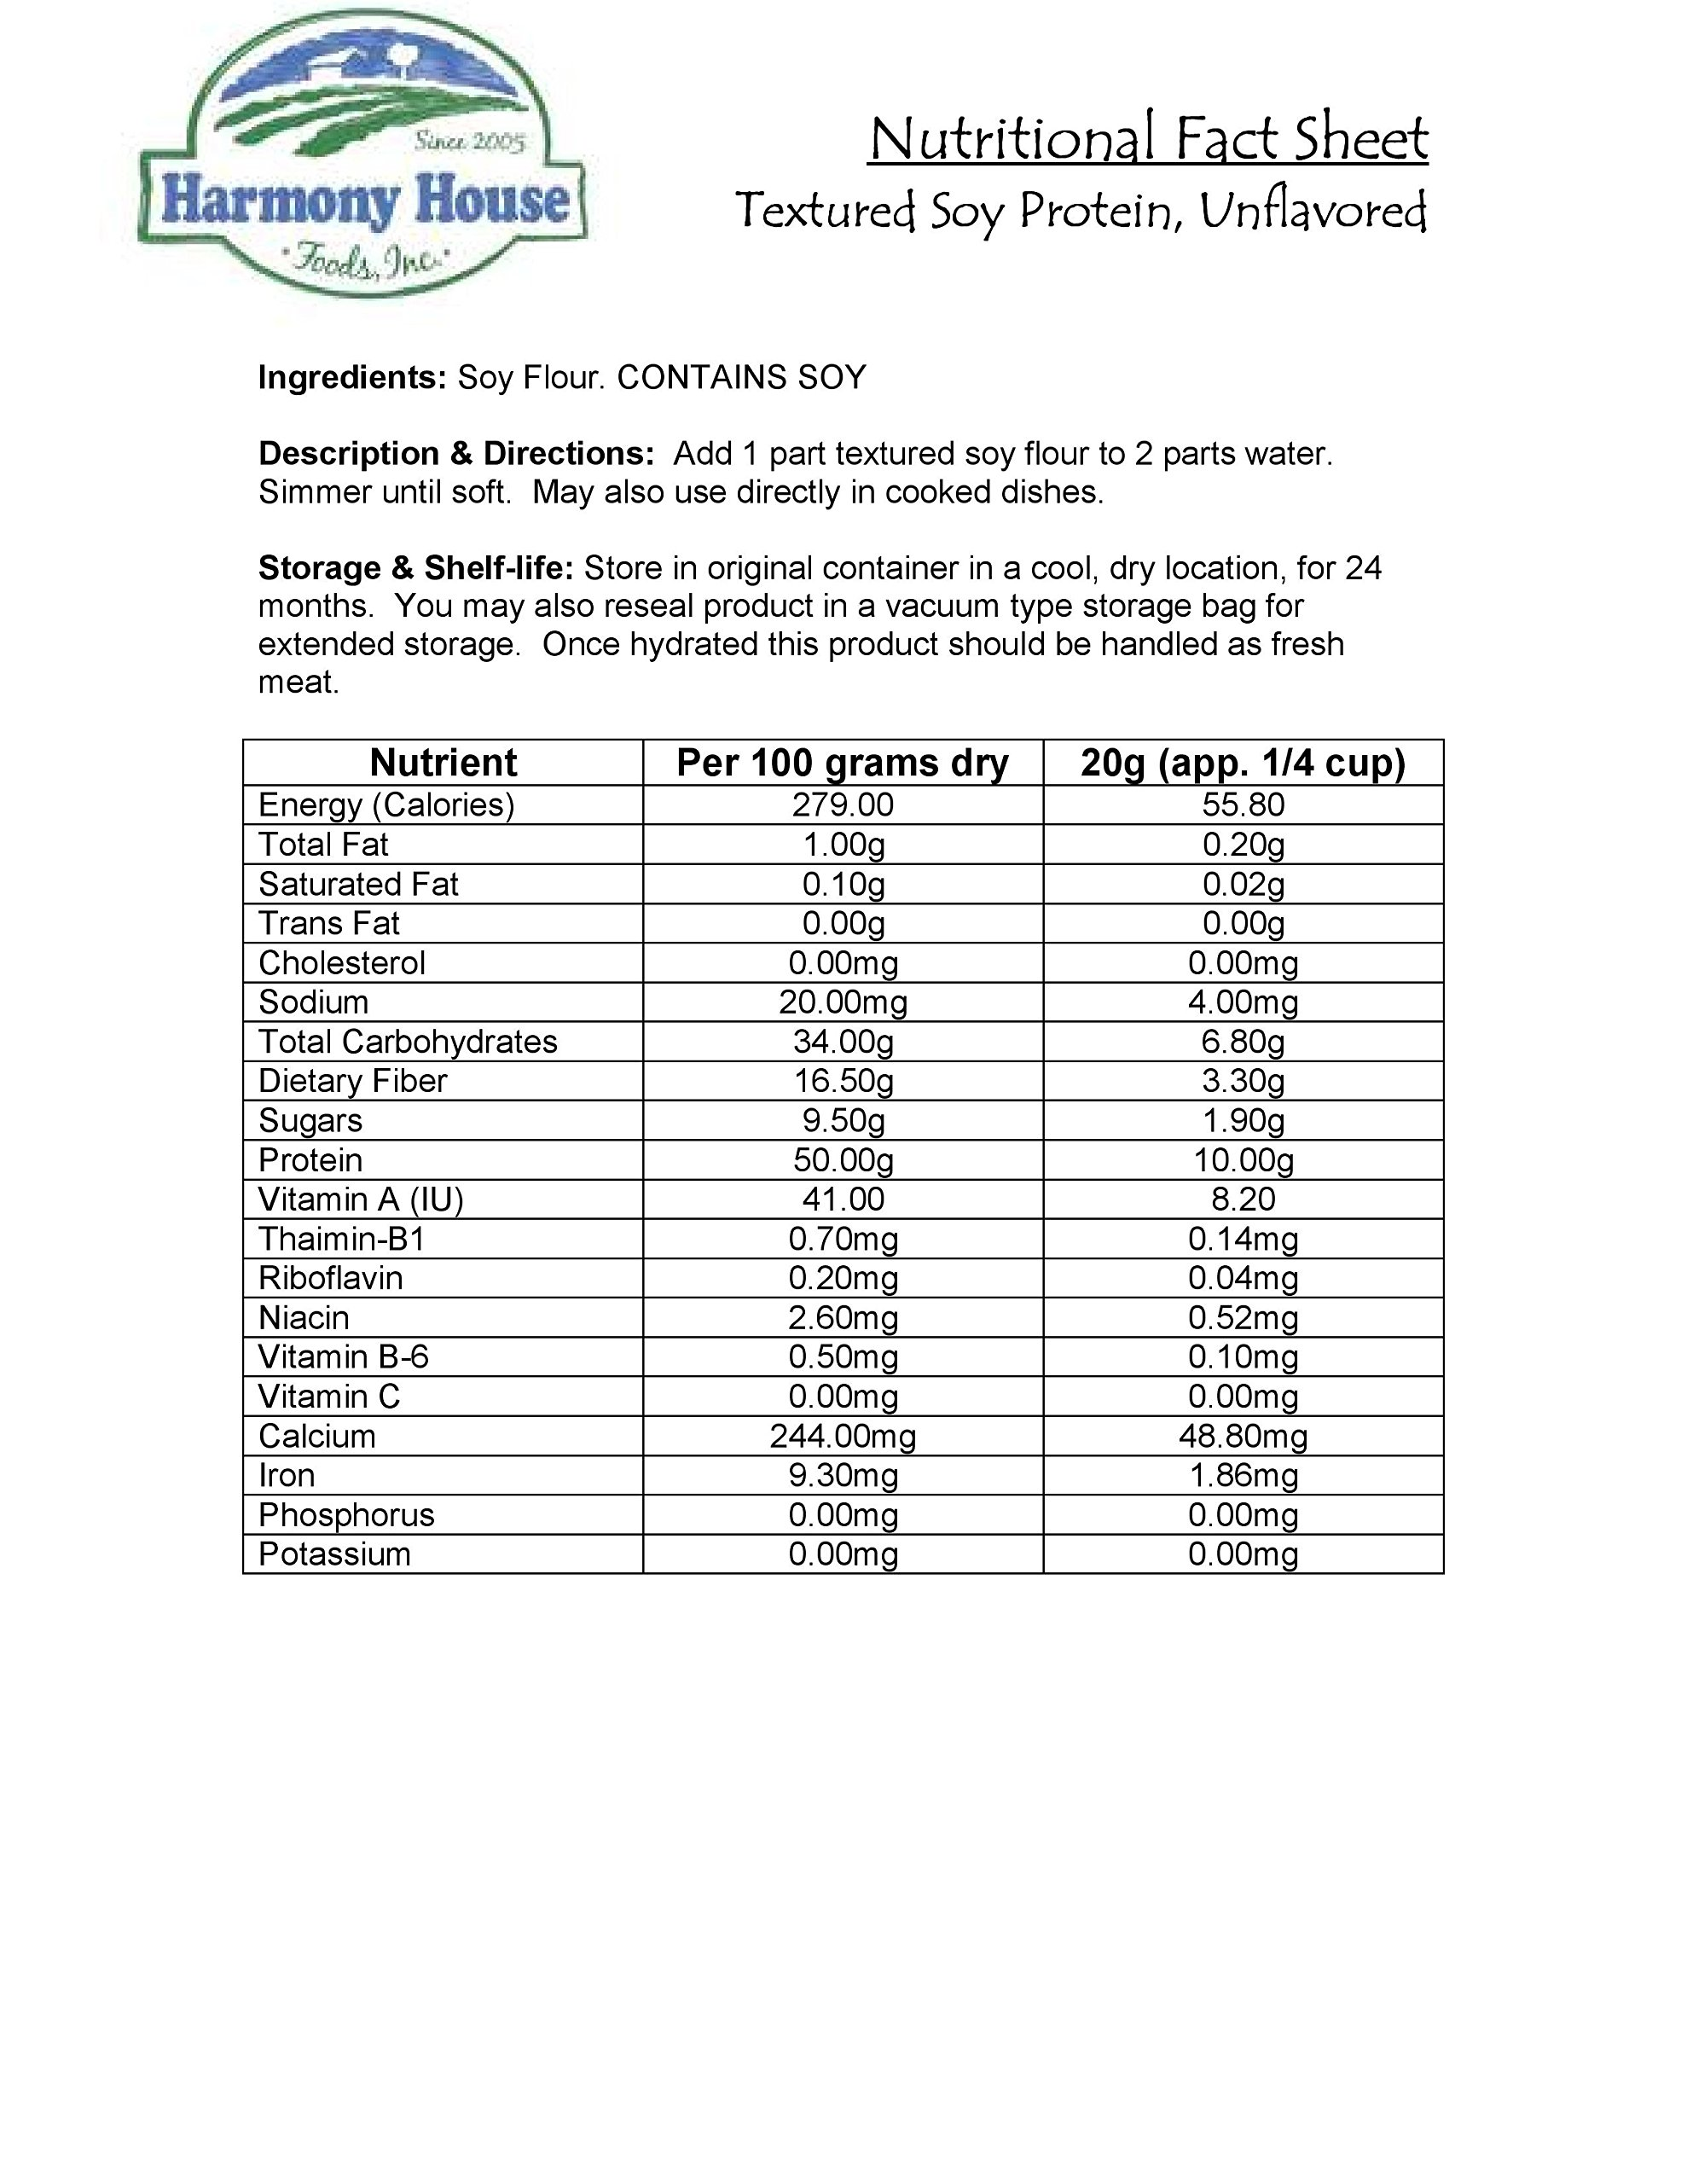 Harmony House Foods Textured Soy Flour, Plain (15 Lbs Bulk Box) - Set of 6 by Harmony House Foods (Image #1)